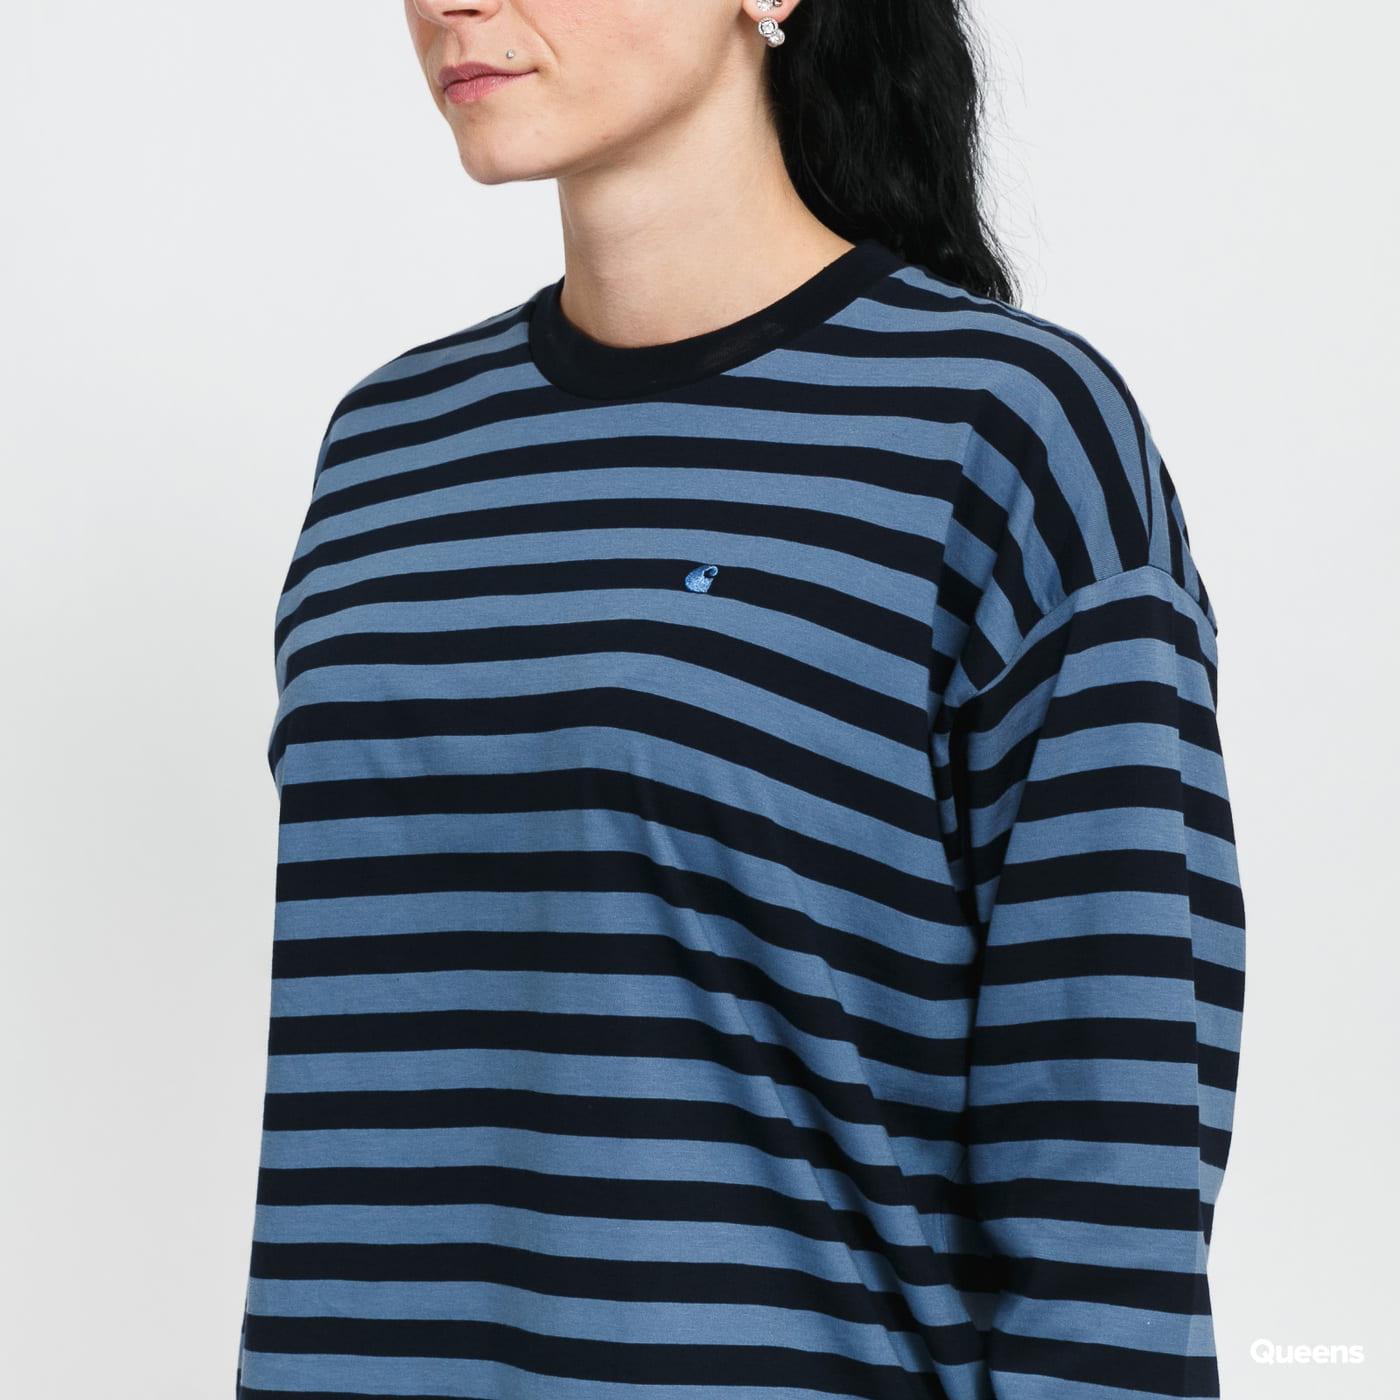 Carhartt WIP W' L/S Scotty T-Shirt navy / blue